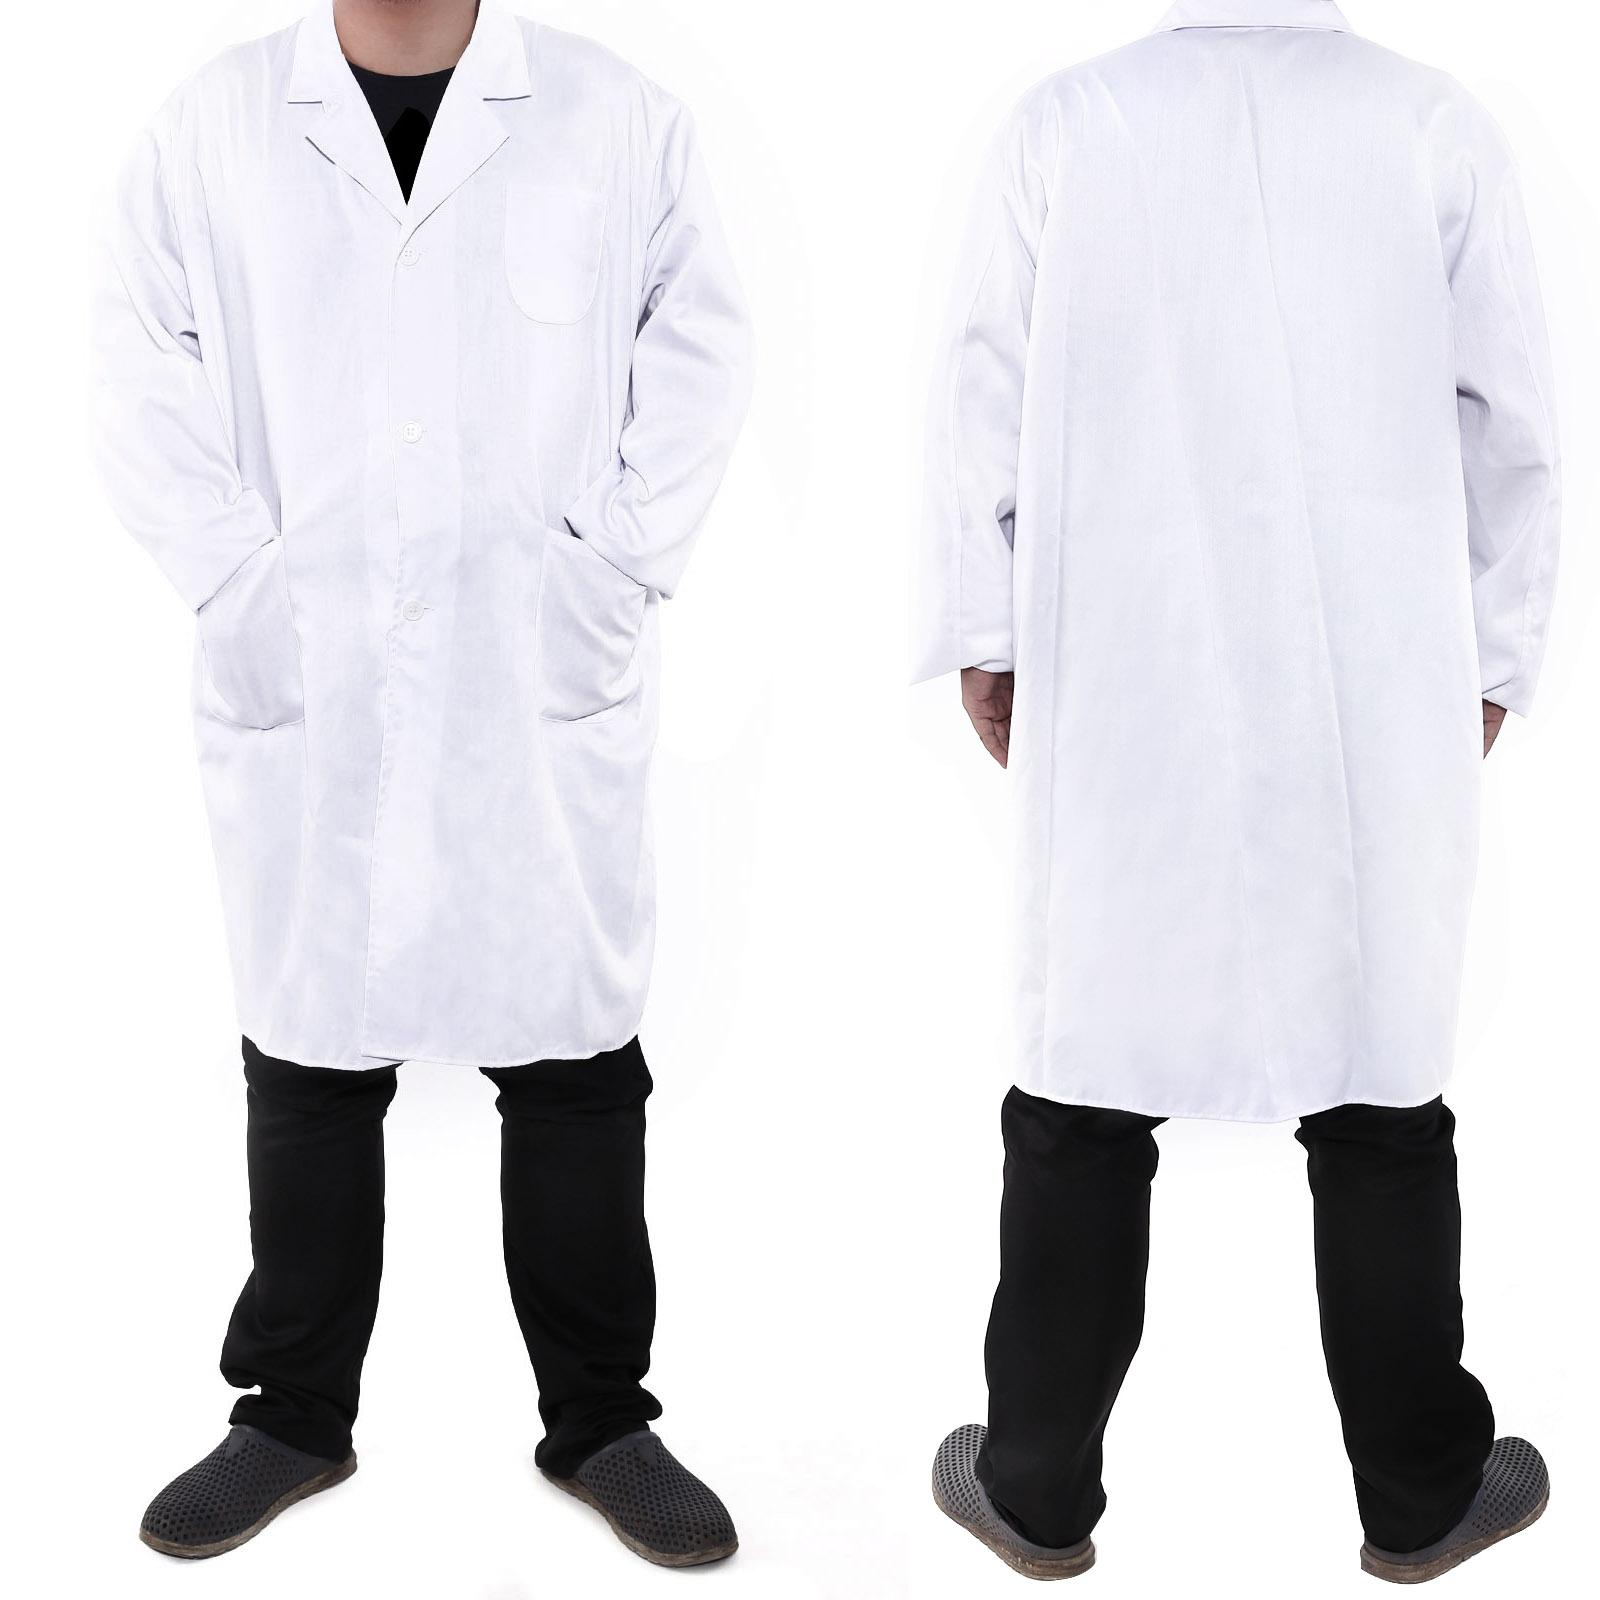 Mens Doctor Costume Lab Coat Medical Surgeon Adult Doctors